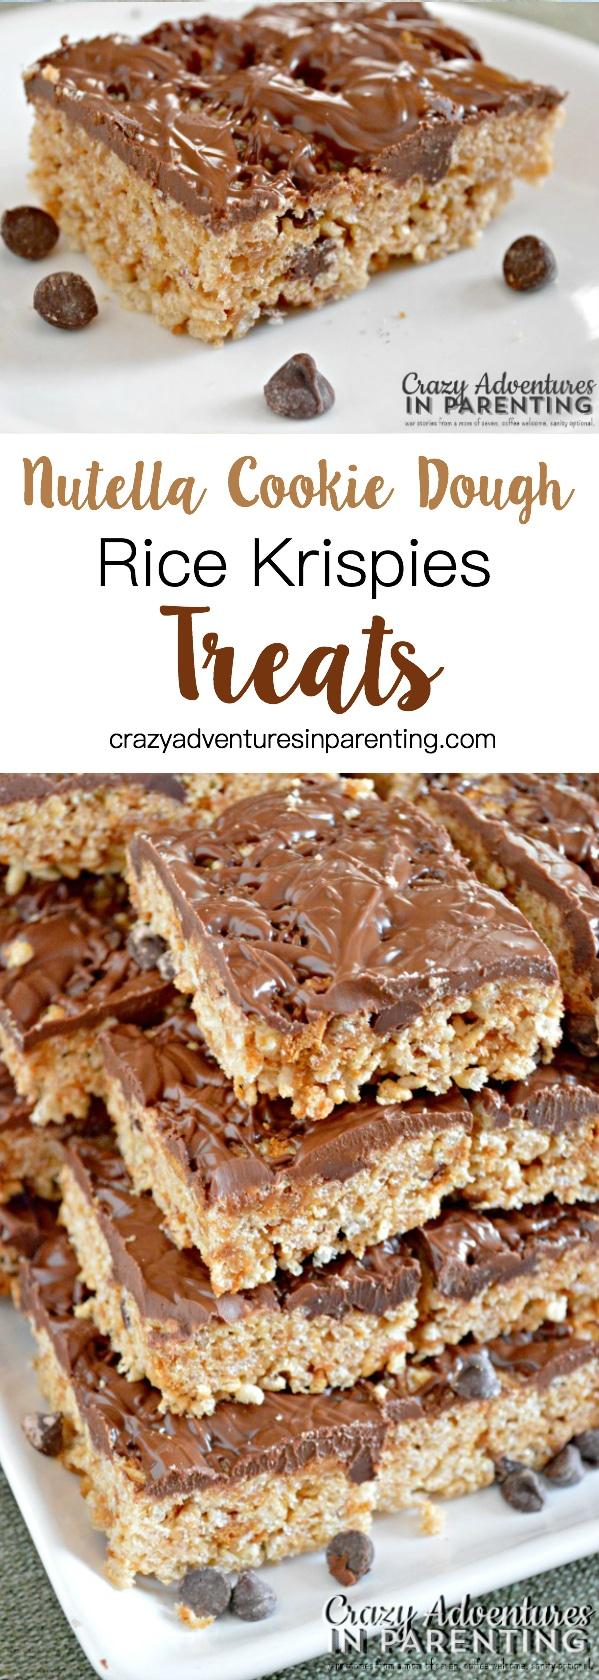 Nutella Cookie Dough Rice Krispies Treats